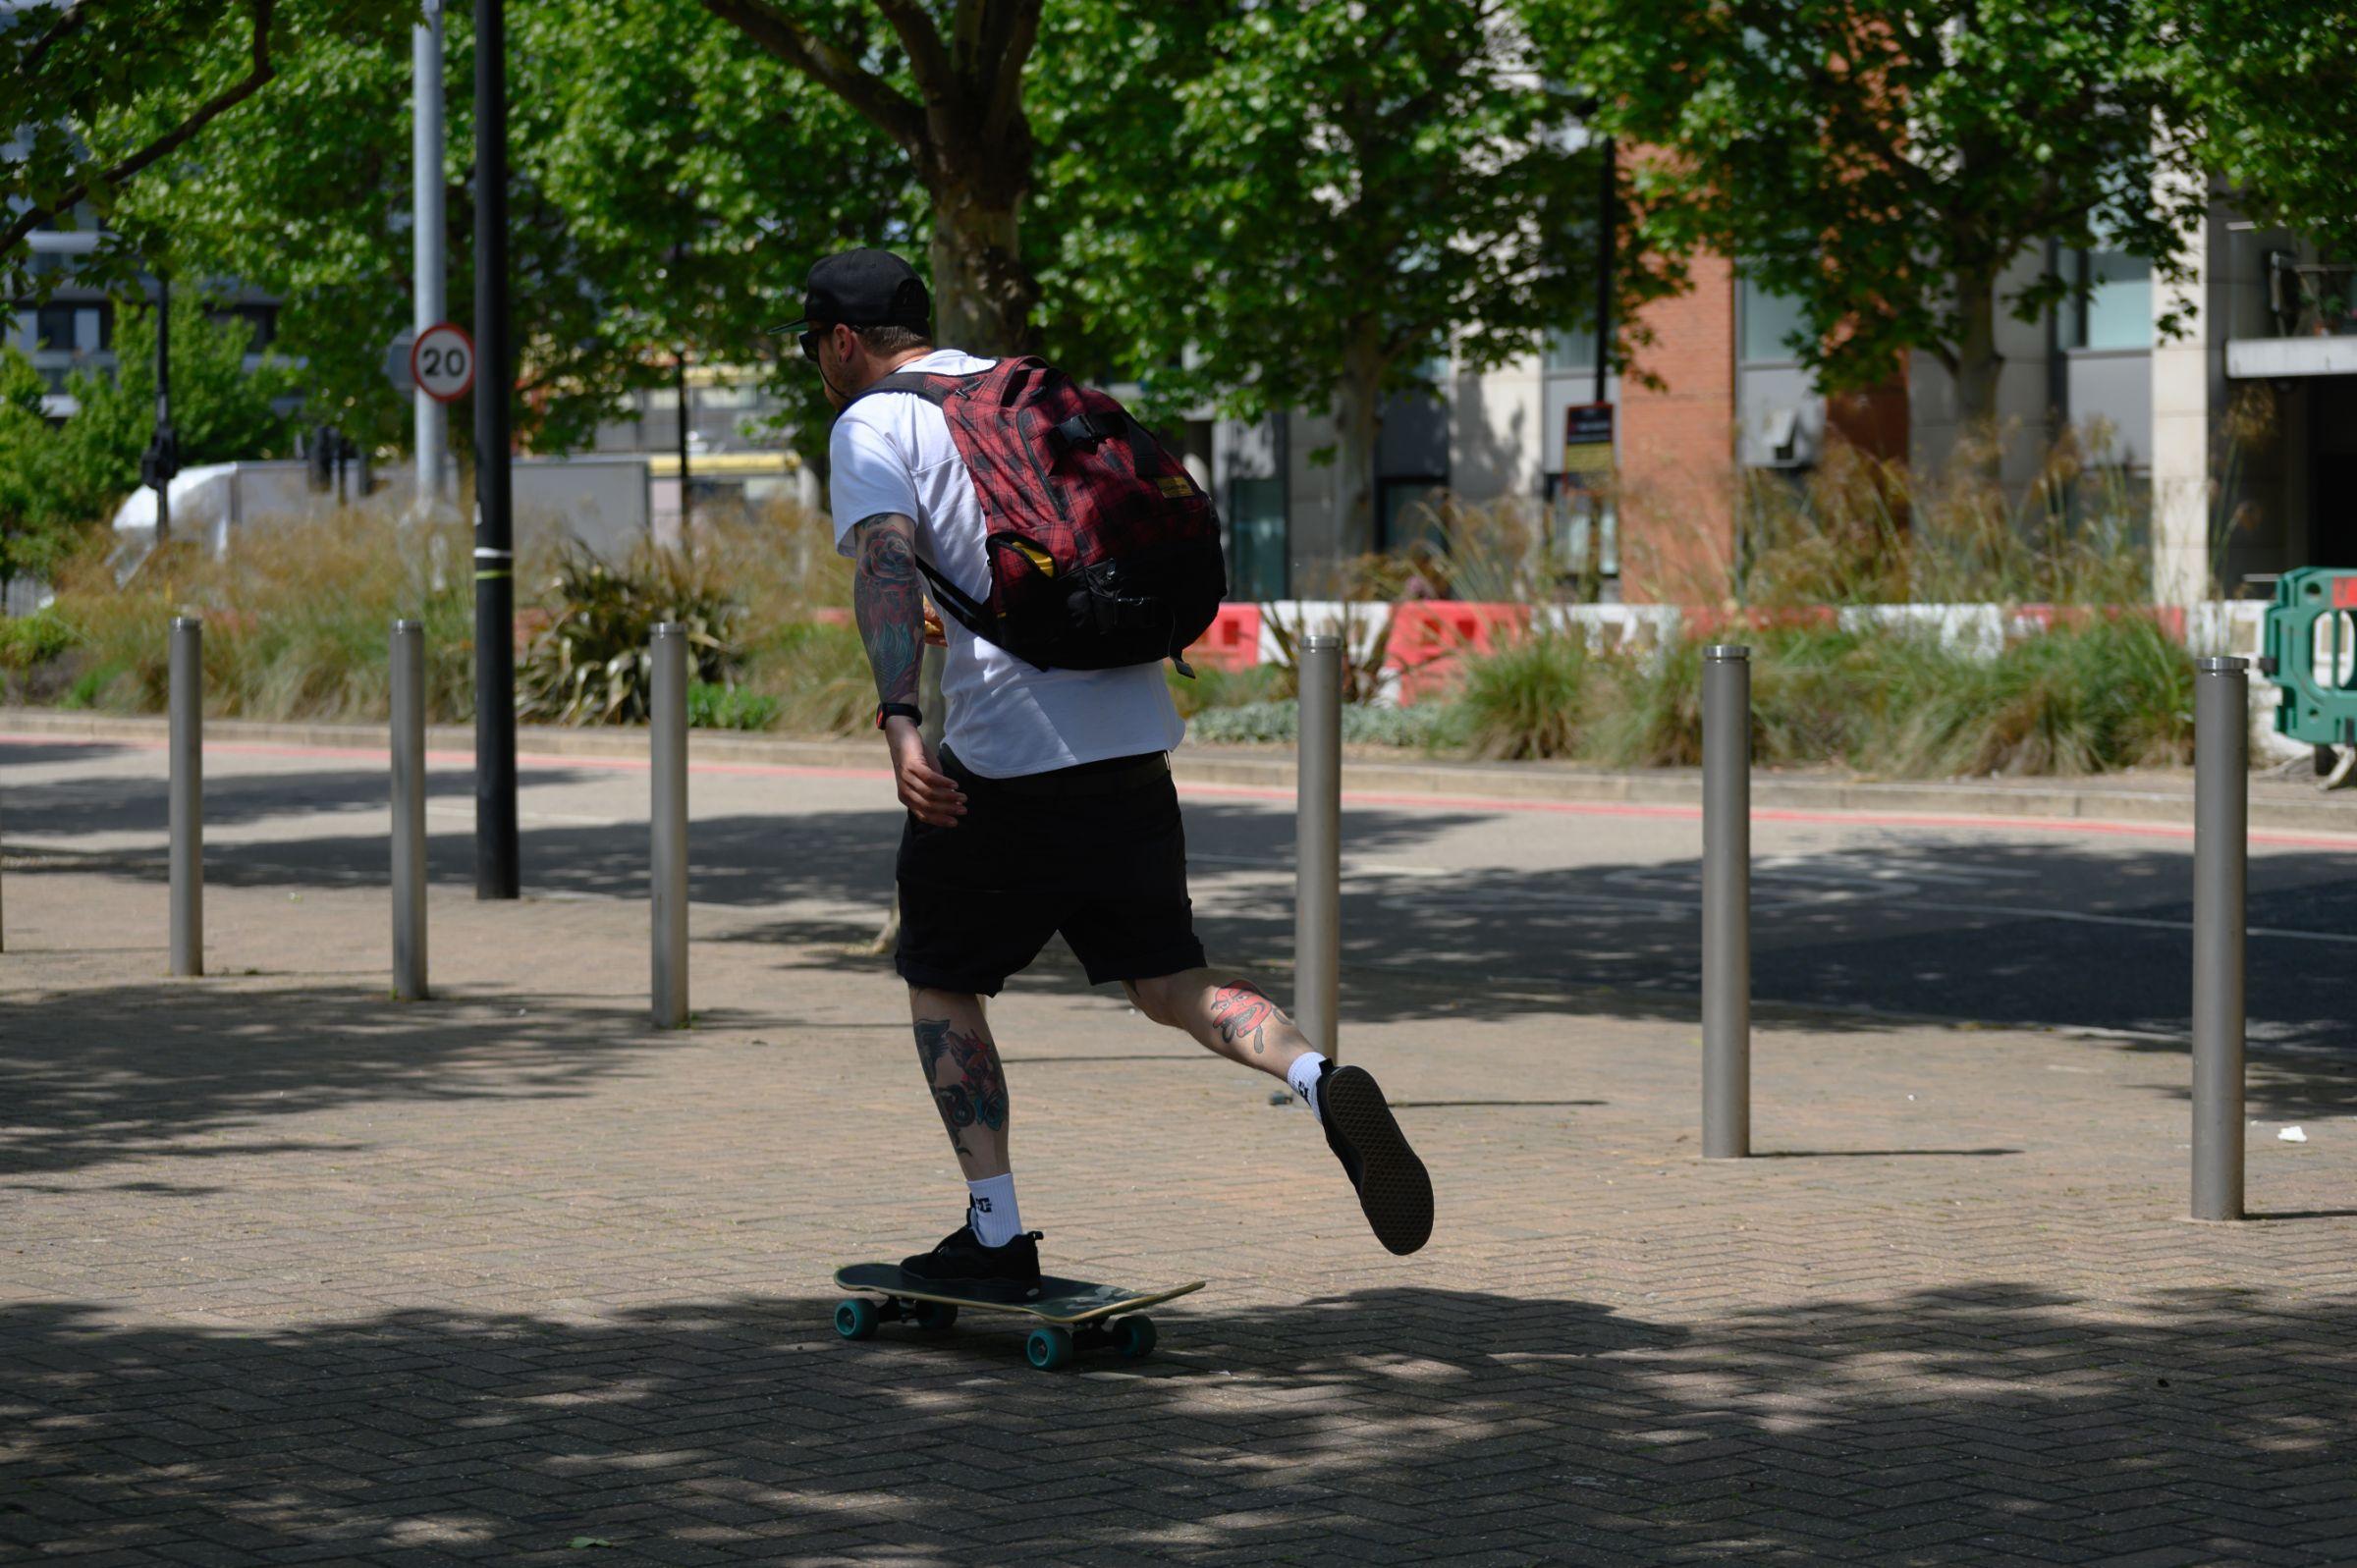 Man riding on a skateboard near the Royal Docks